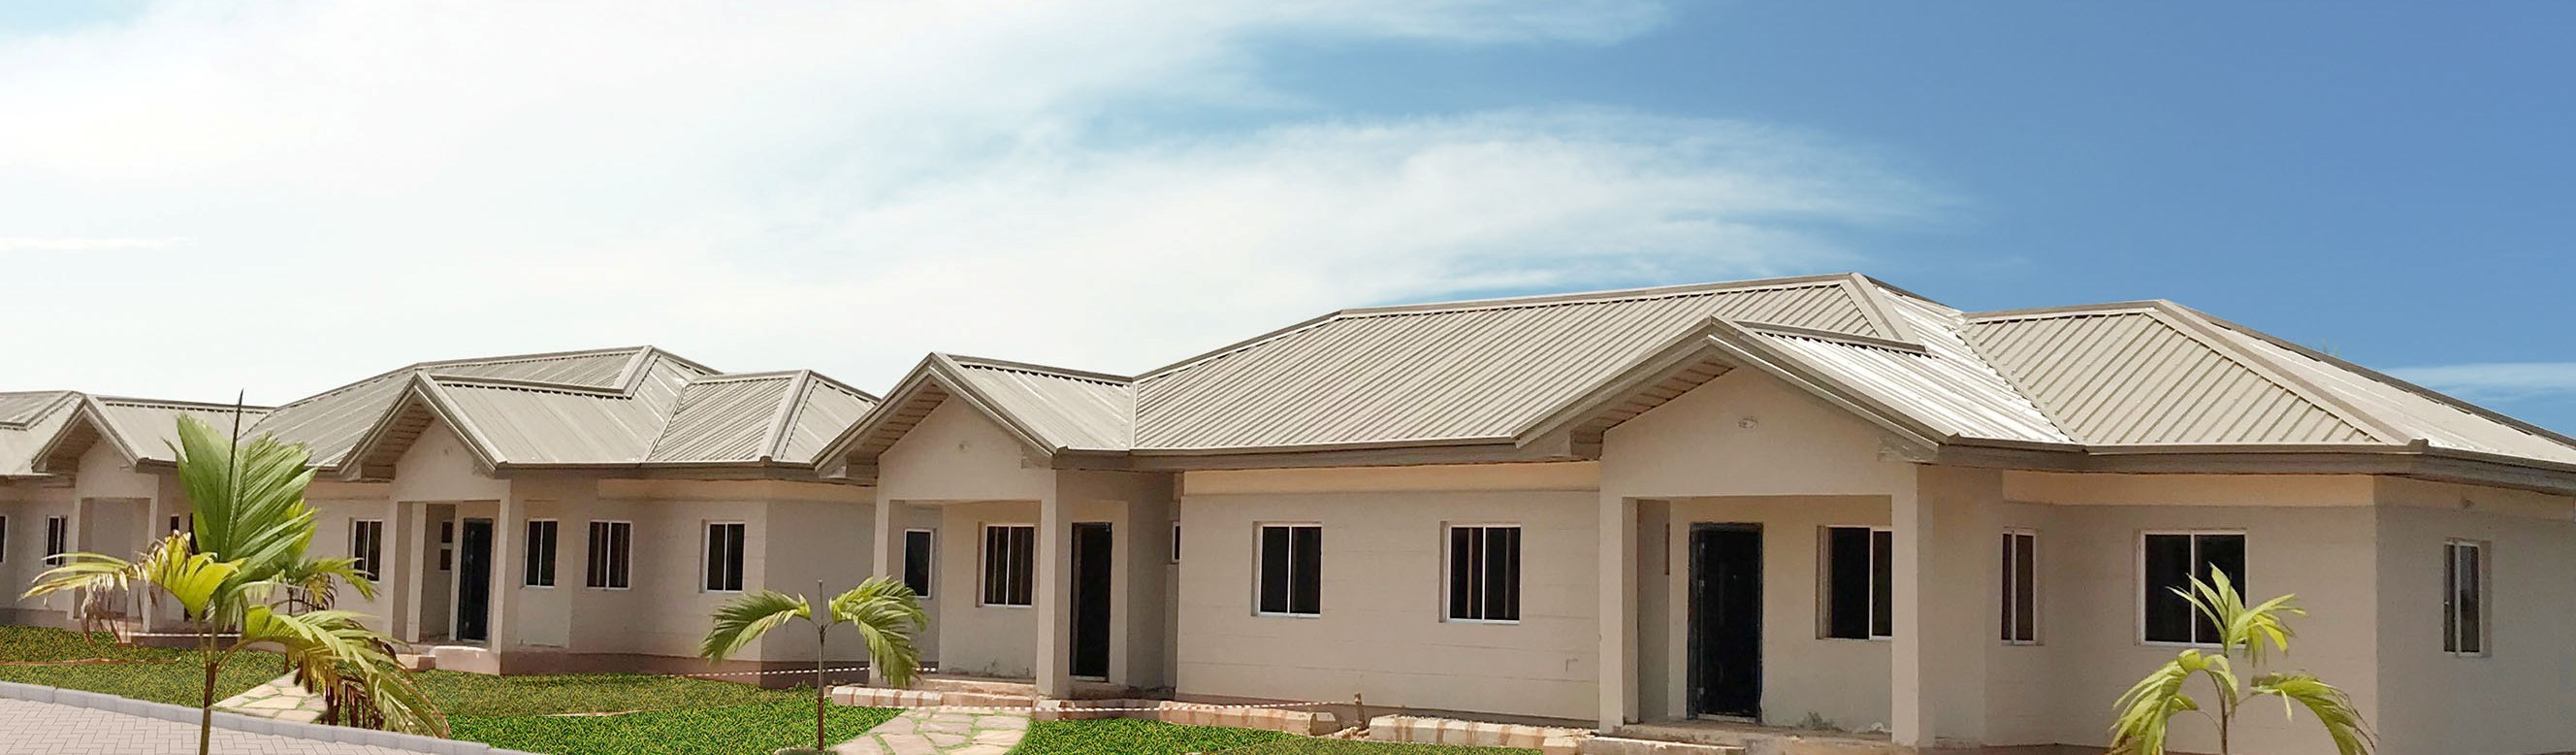 Alaghodaro: Obaseki, Mixta Nigeria woo Diaspora community with Emotan Gardens